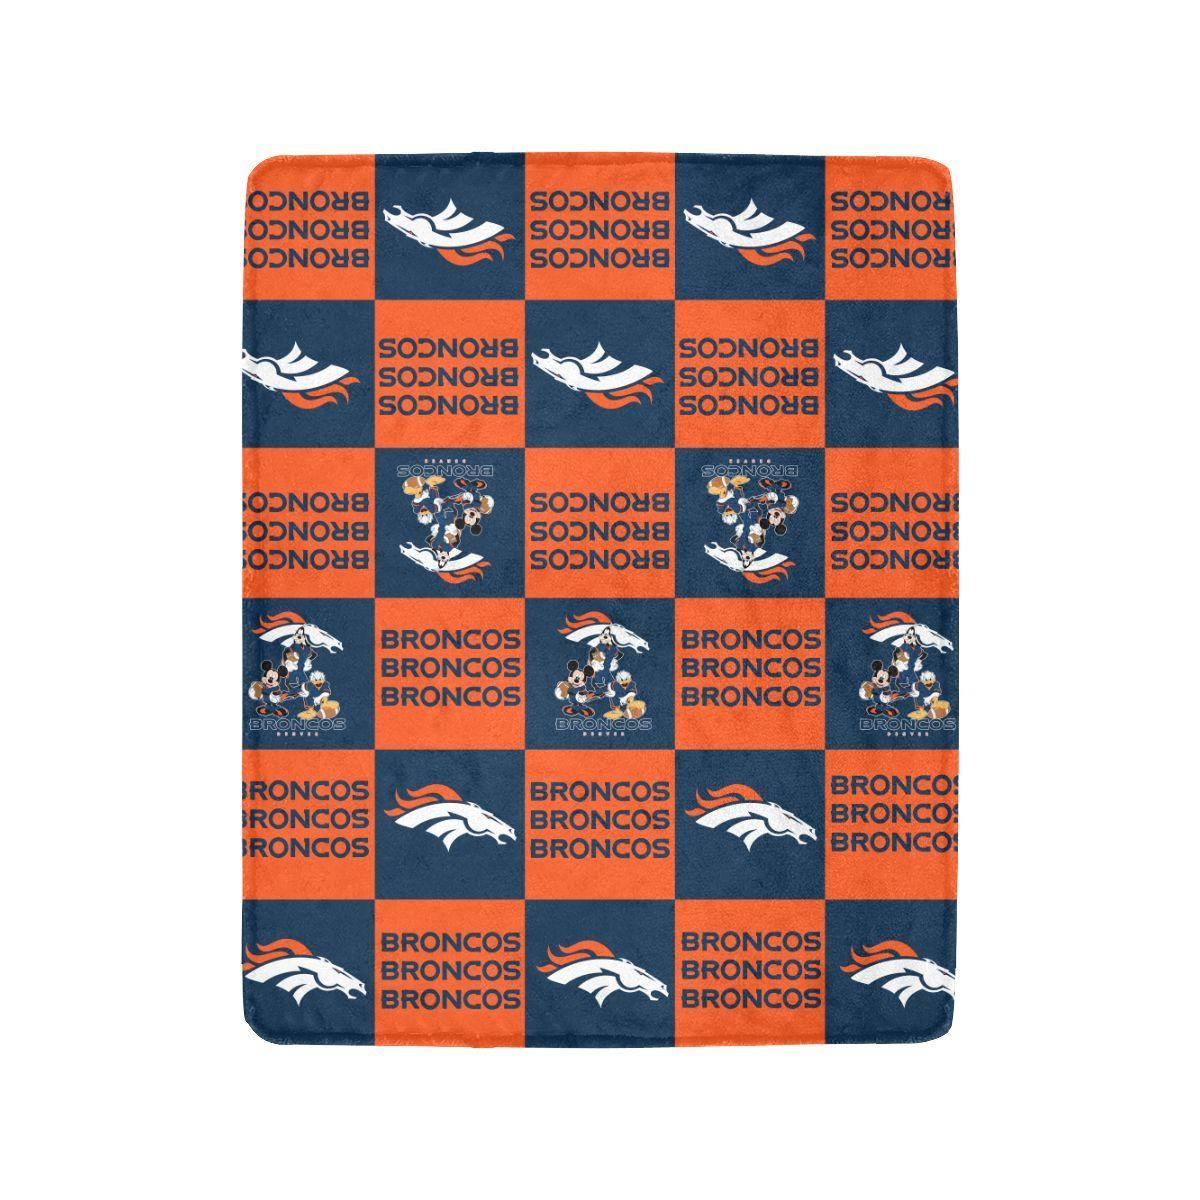 Home Lapommenyc Store Broncos, Nfl denver broncos